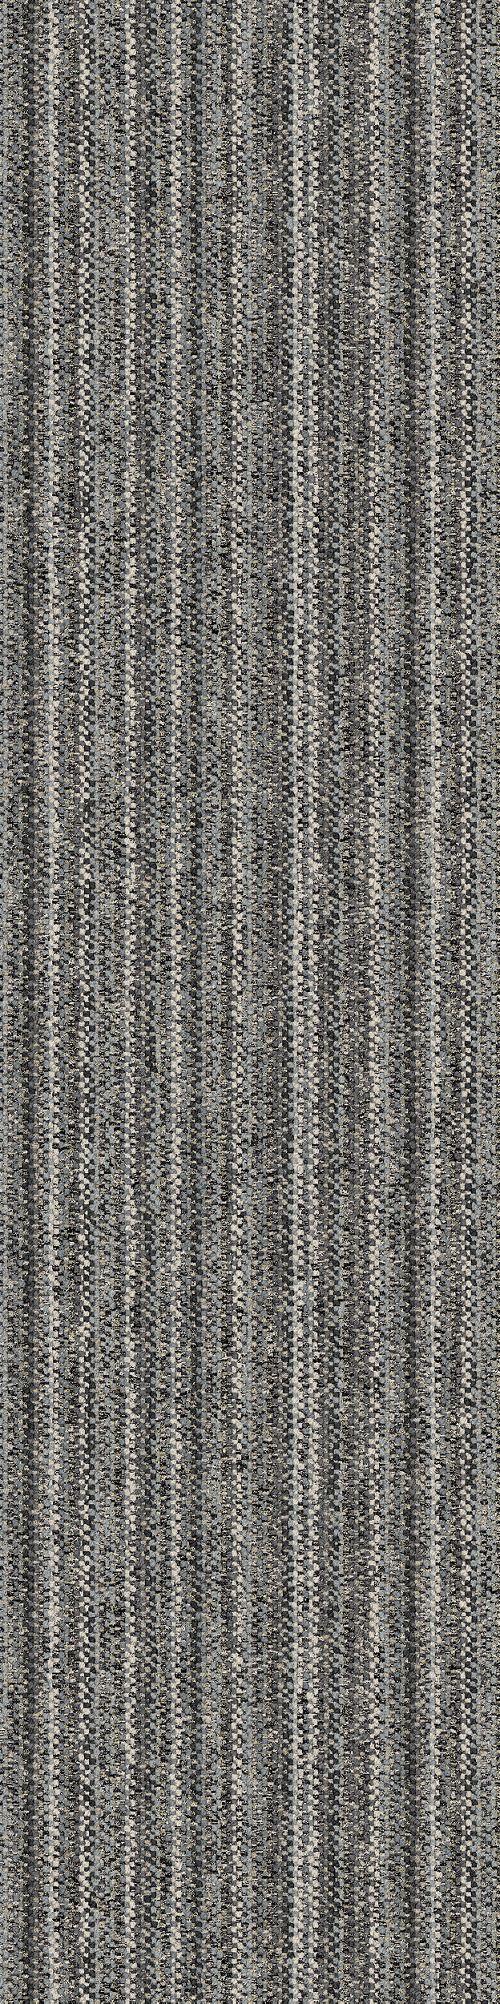 Interface carpet tile: WW865 Color name: Moorland Warp